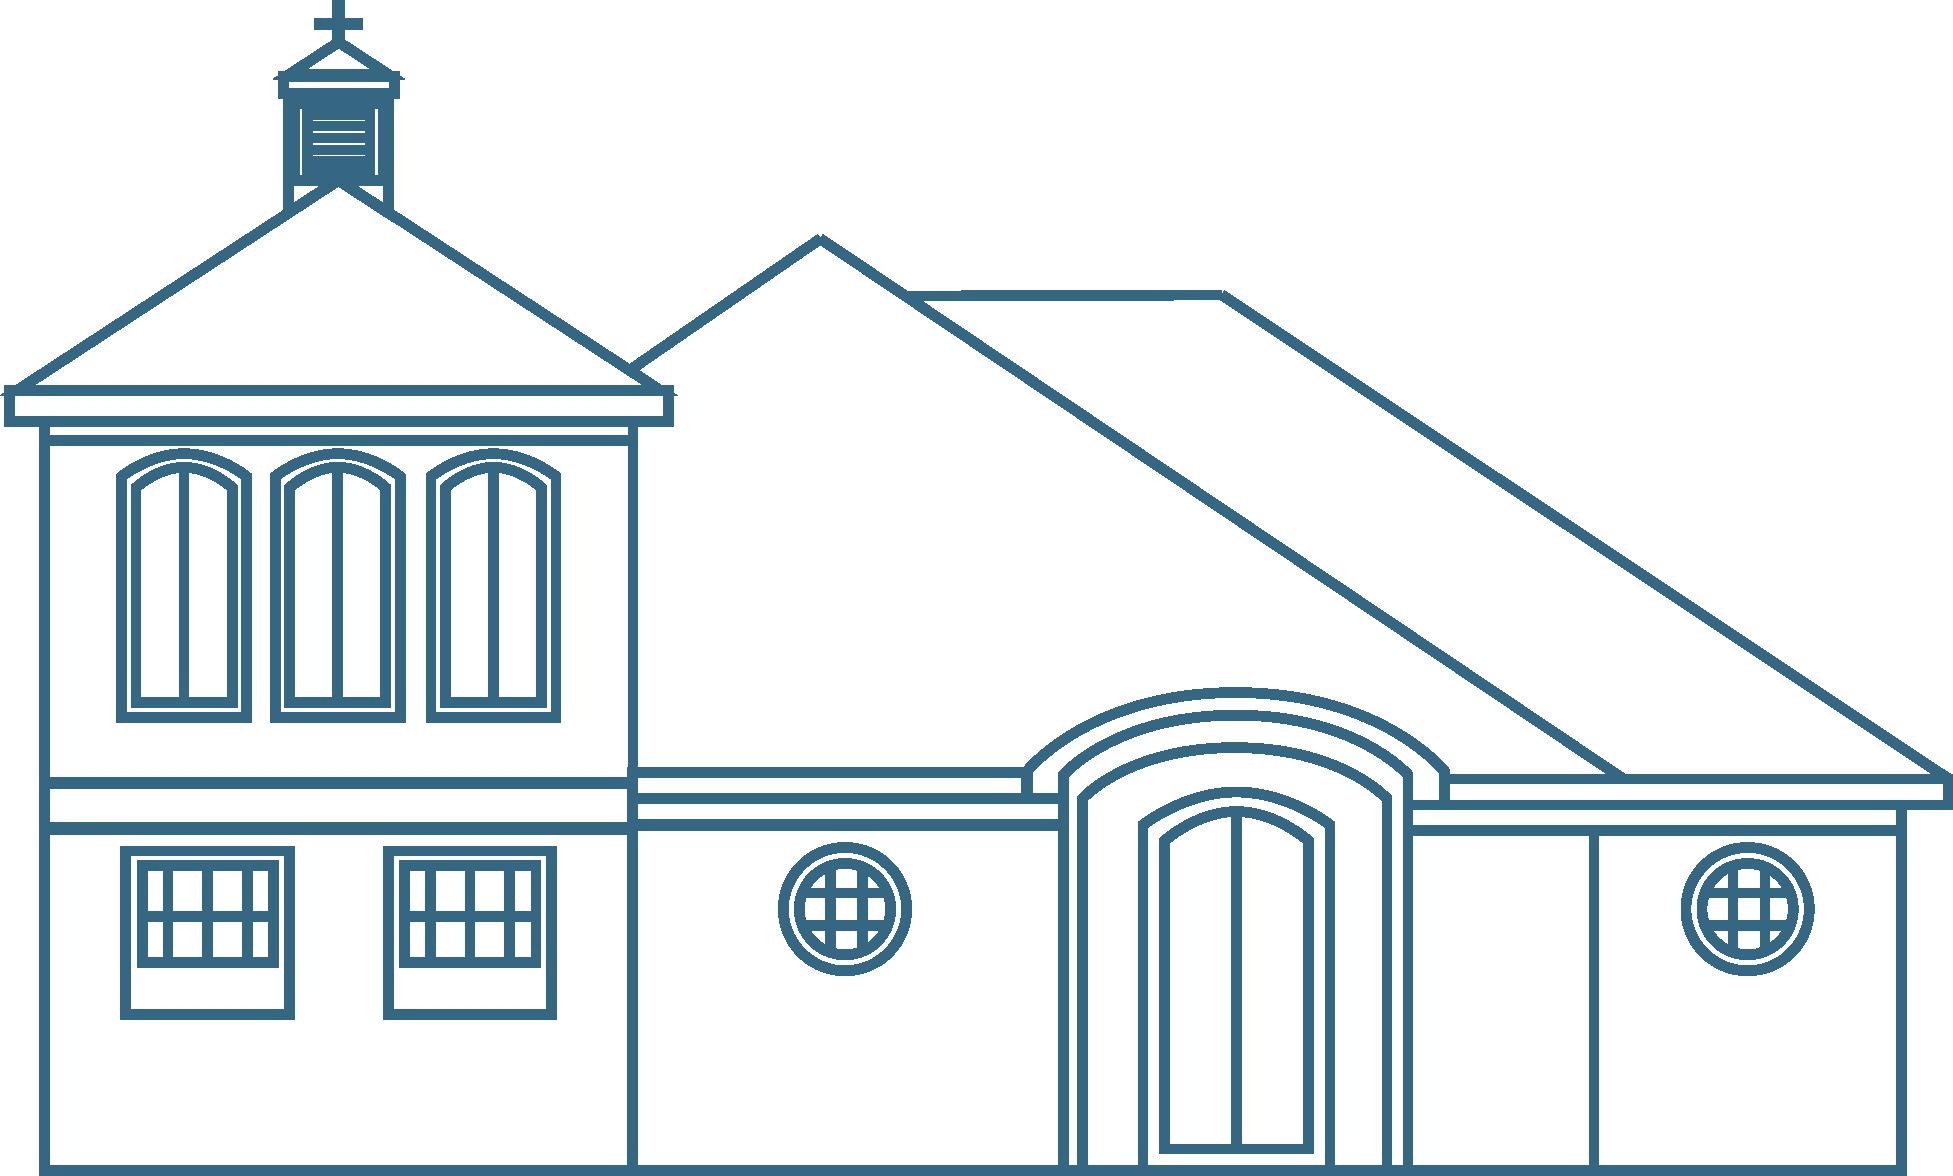 Glisson services . Contractor clipart housing construction